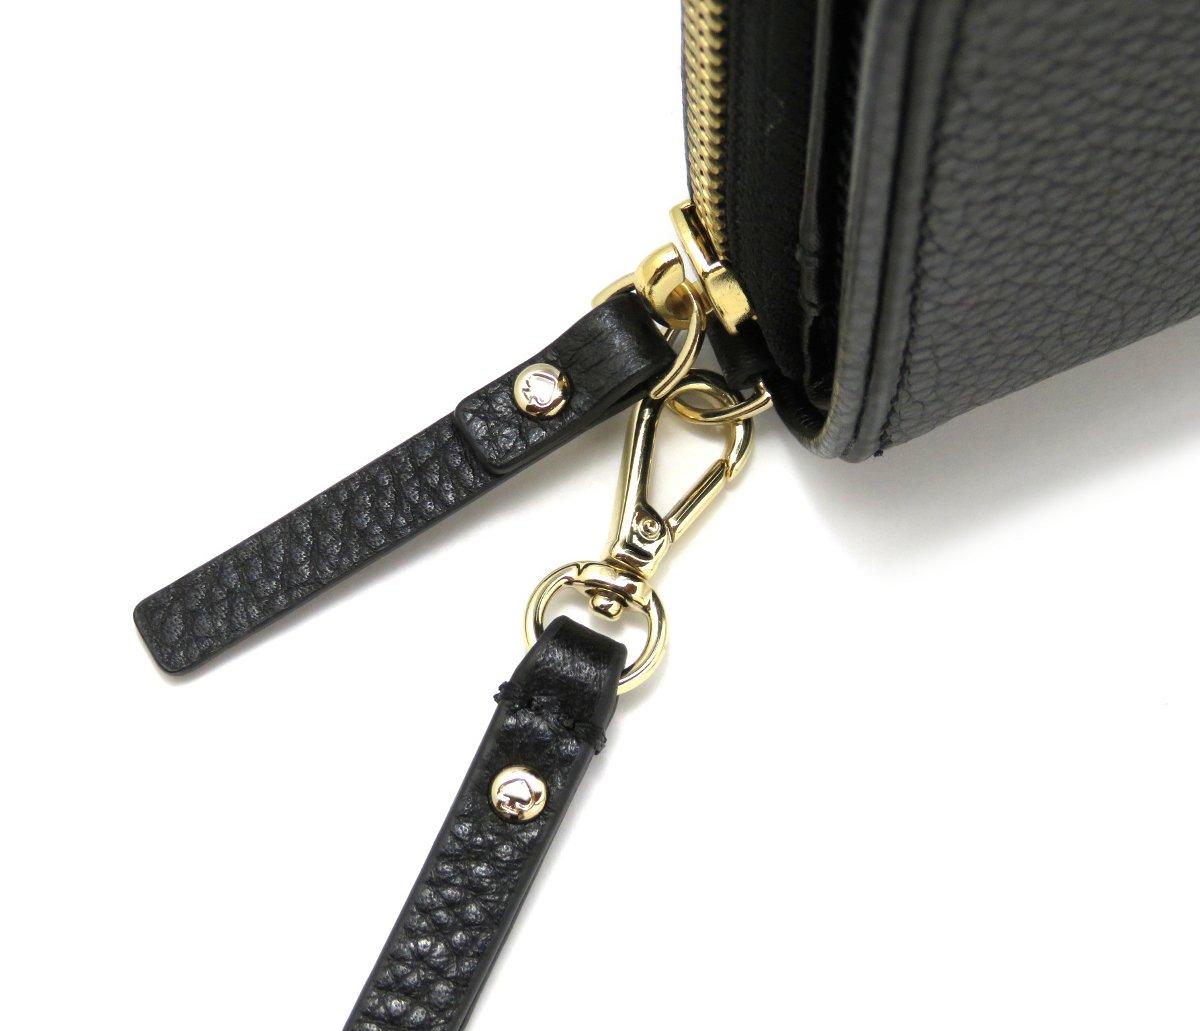 Kate Spade New York Mulberry Street Brigitta Wristlet Wallet Handbag (Black) by Kate Spade New York (Image #7)